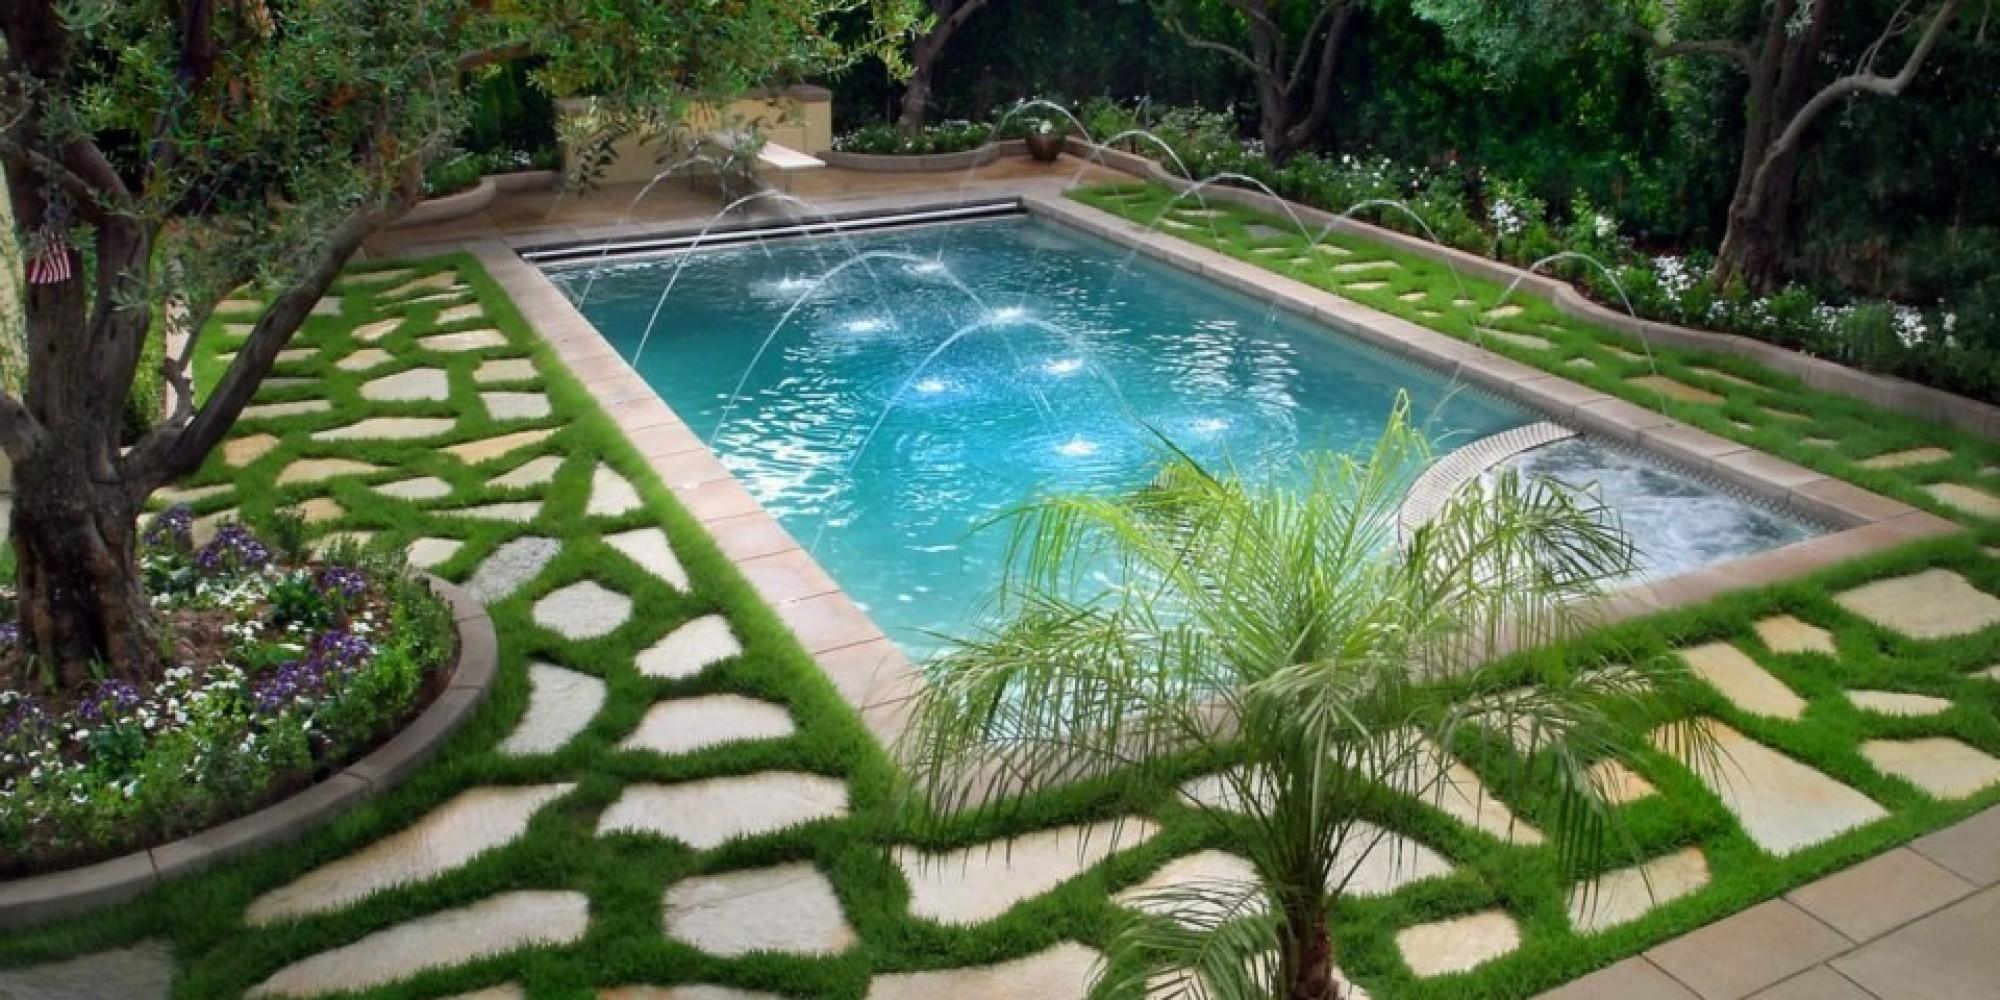 Backyard gardens - These 11 Incredible Backyard Gardens Are What Dreams Are Made Of Photos Huffpost